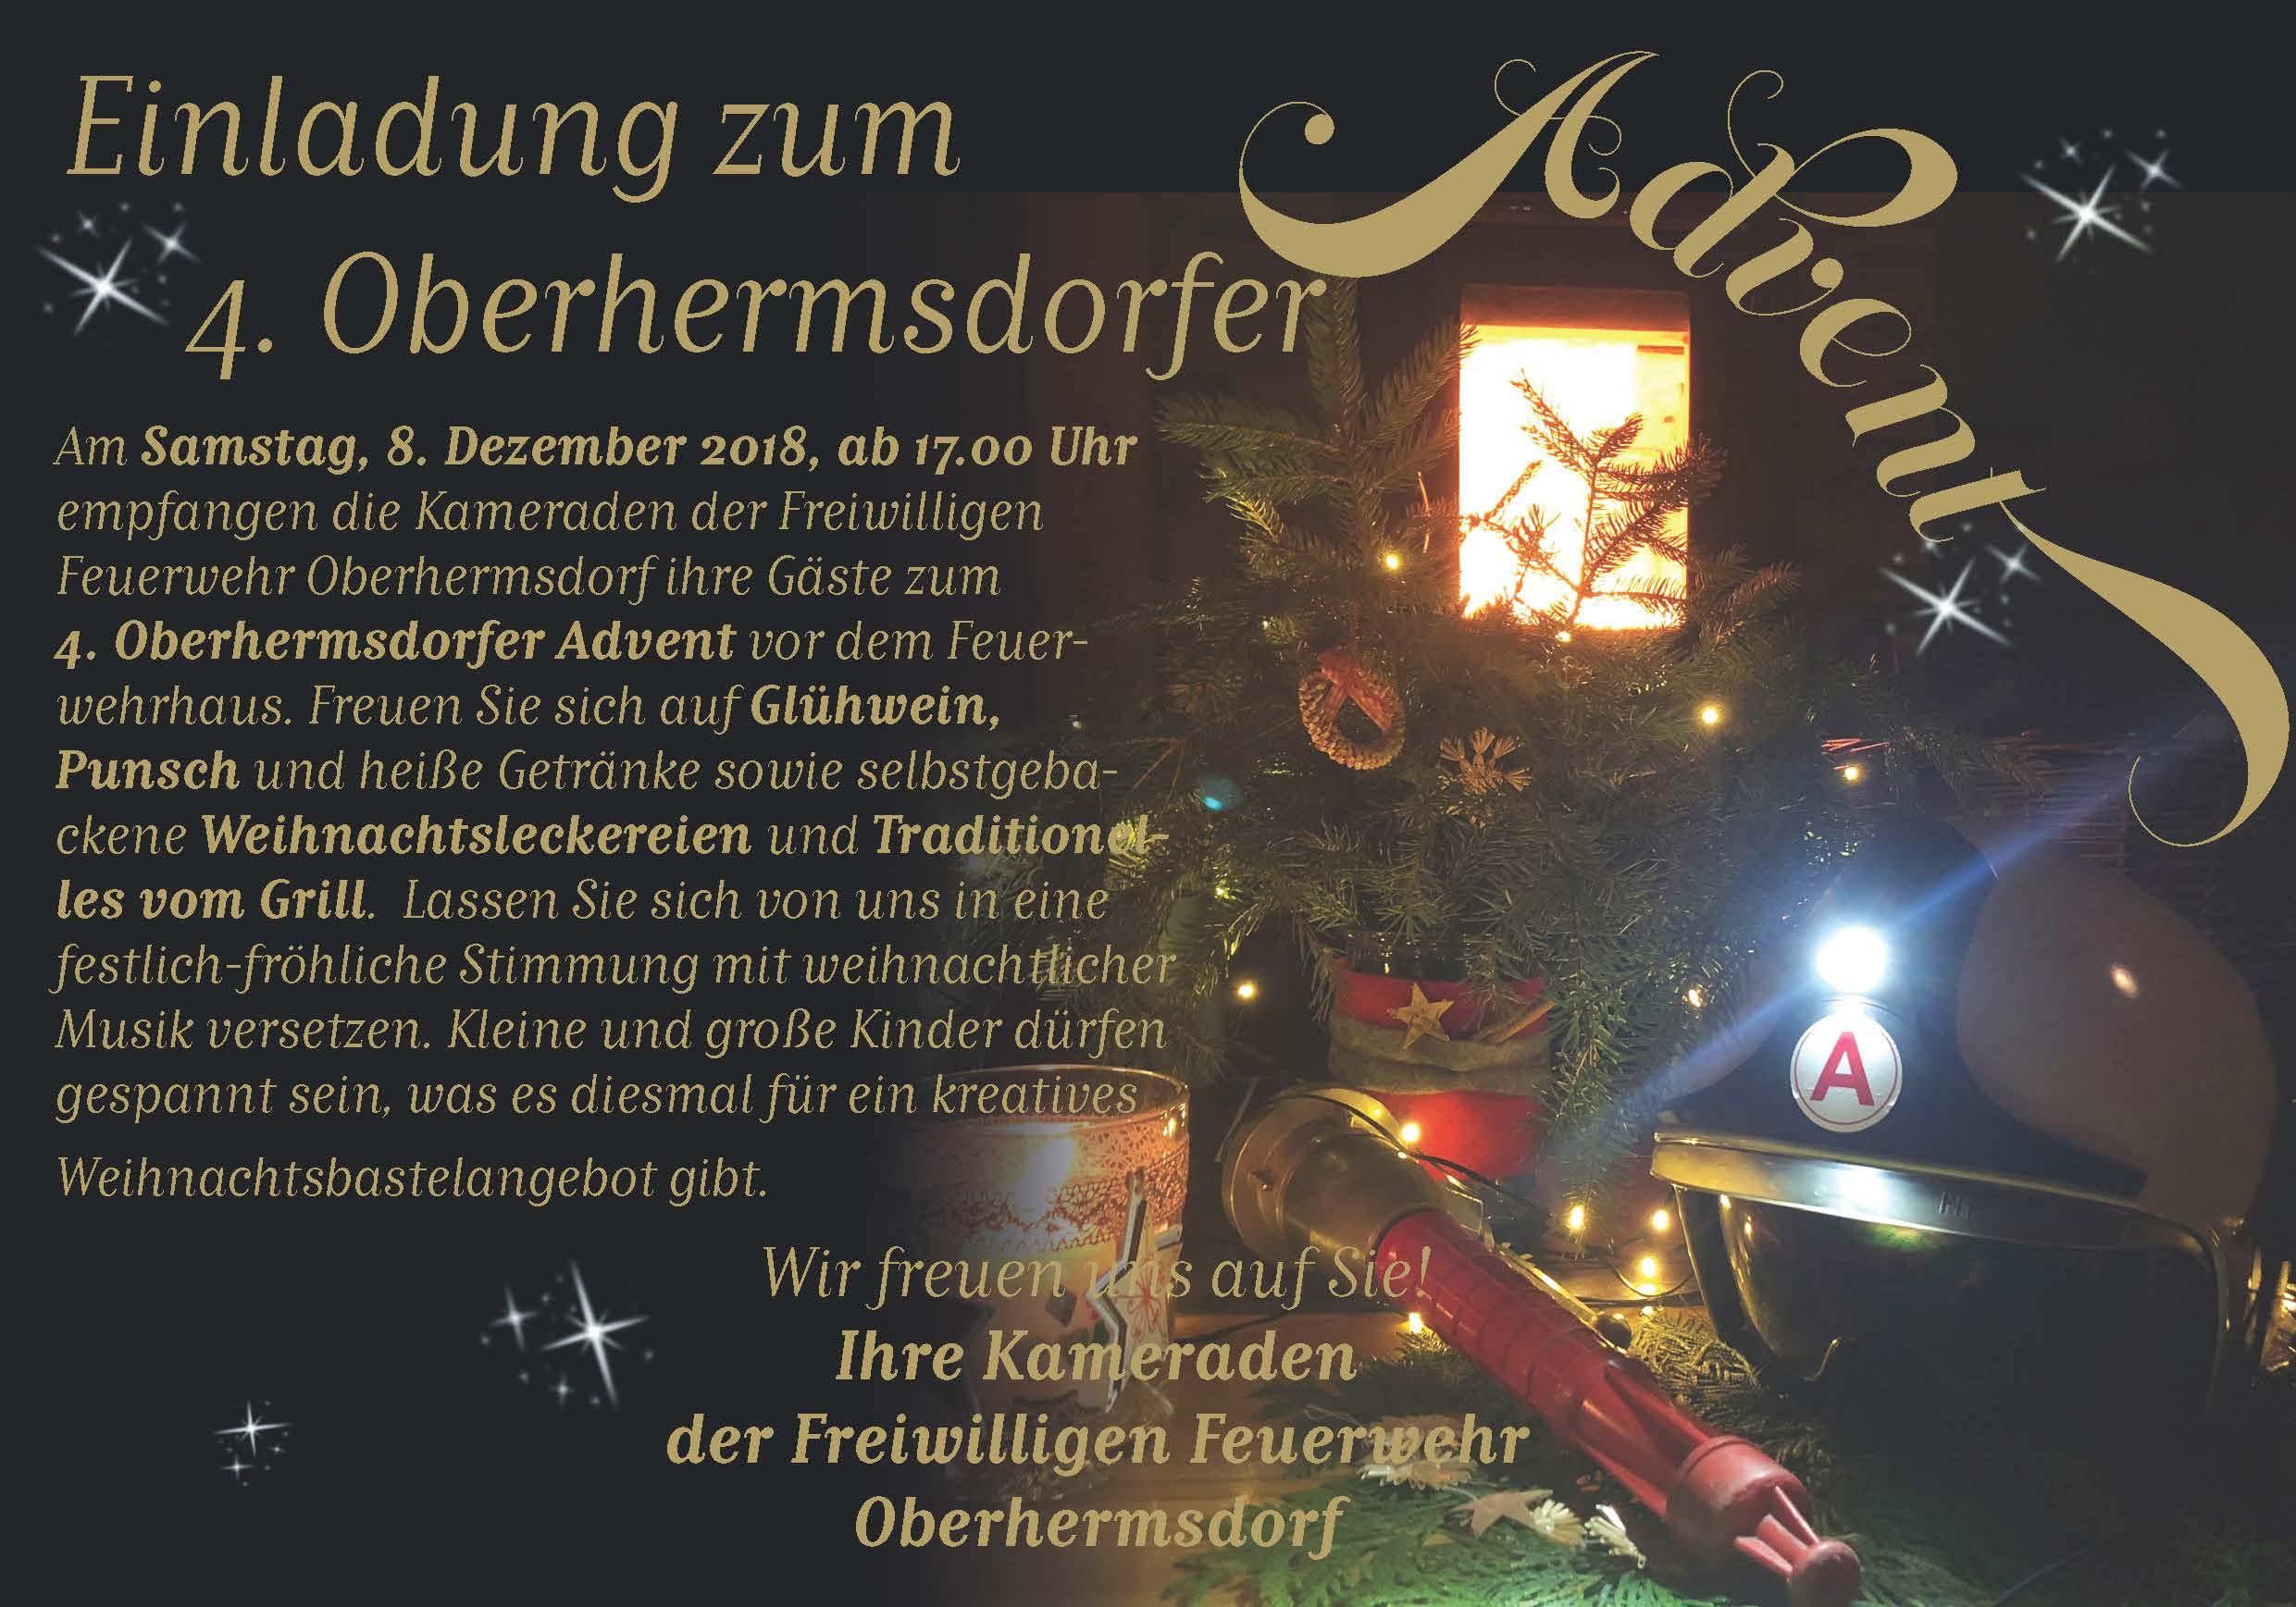 2018-12-08_Advent Oberhermsdorf.jpg